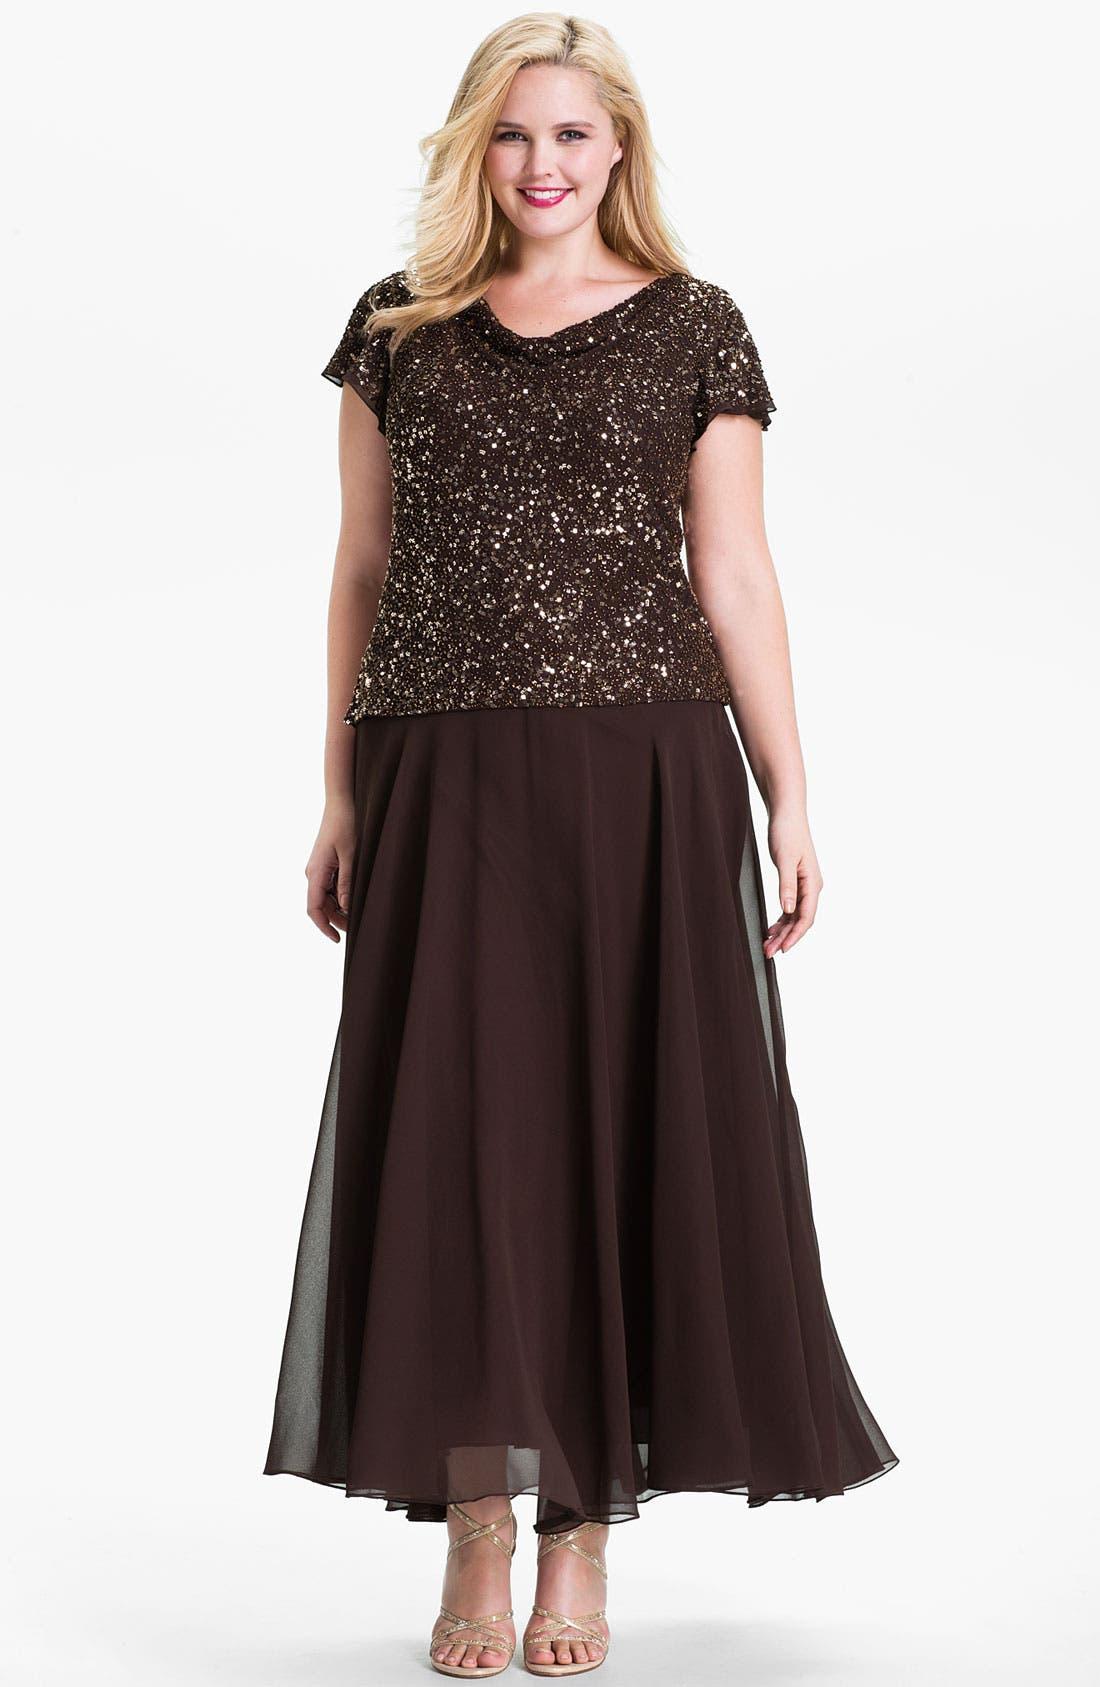 Alternate Image 1 Selected - J Kara Sequin Flutter Sleeve Chiffon Gown (Plus)